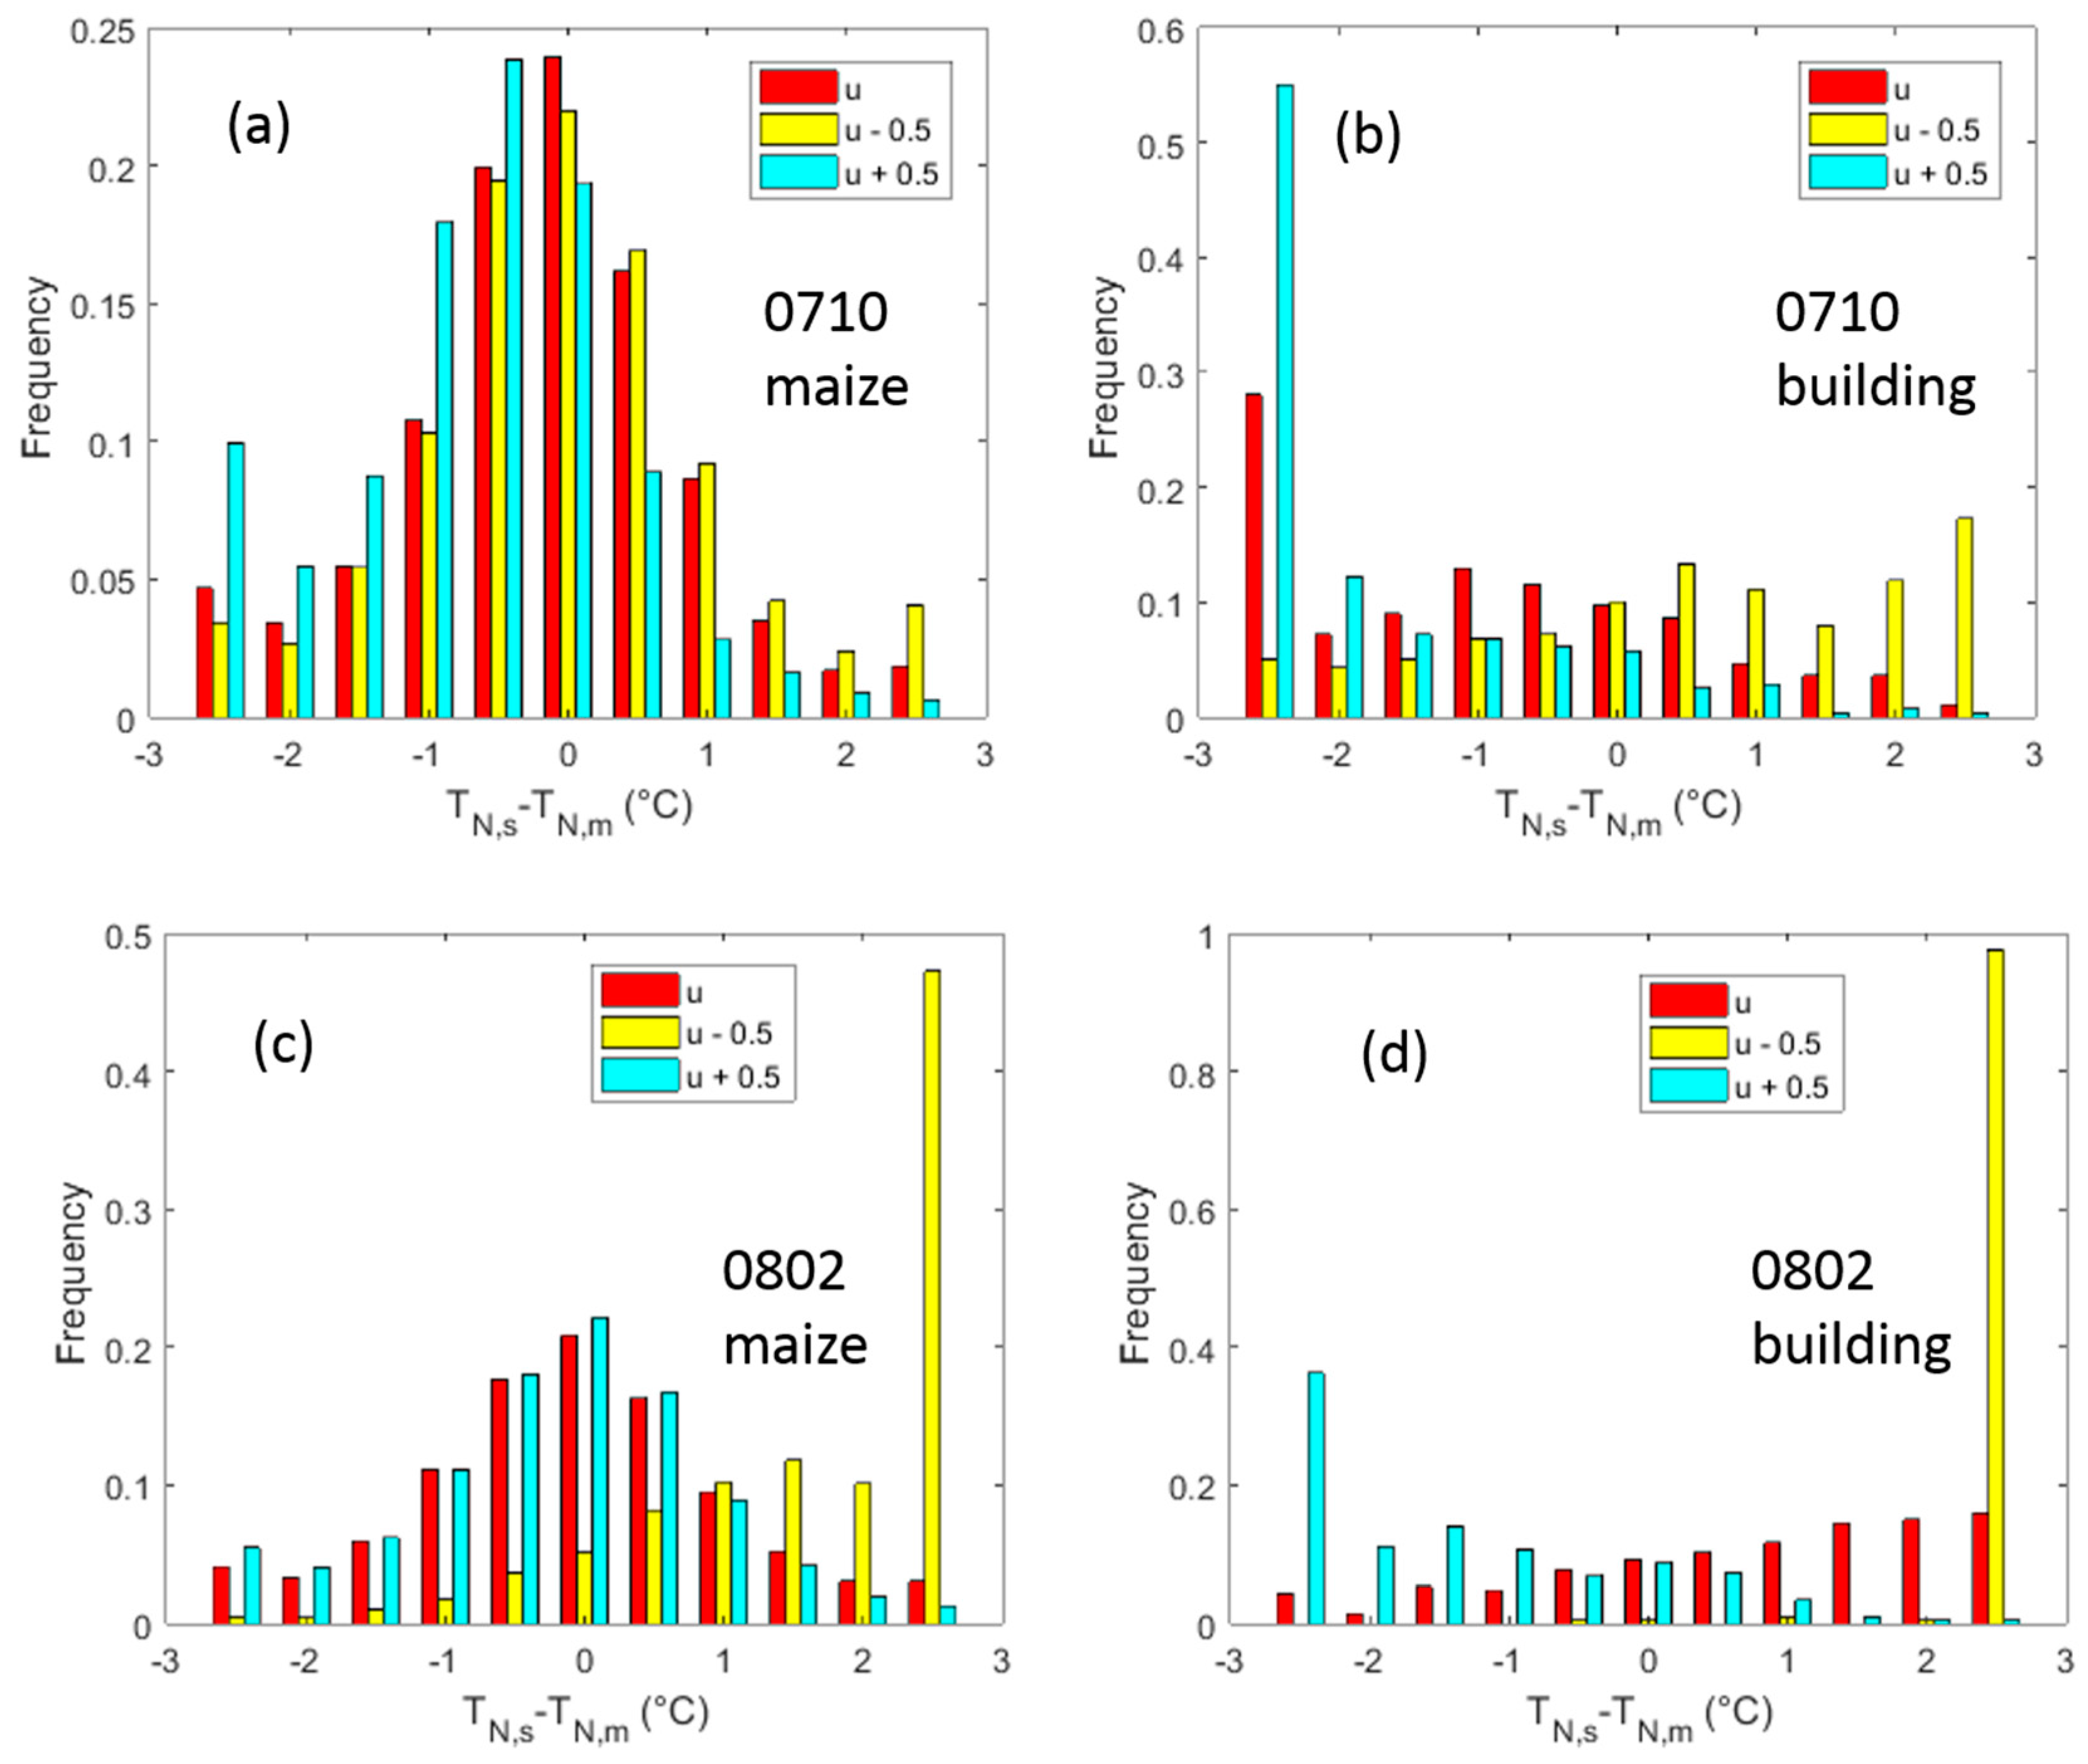 thermalinfrared remote sensing urban heat islands essay Int j remote sensing, 1997, vol 18, no 2,  application of high-resolution thermal infrared remote sensing and gis to assess the urban heat island effect.